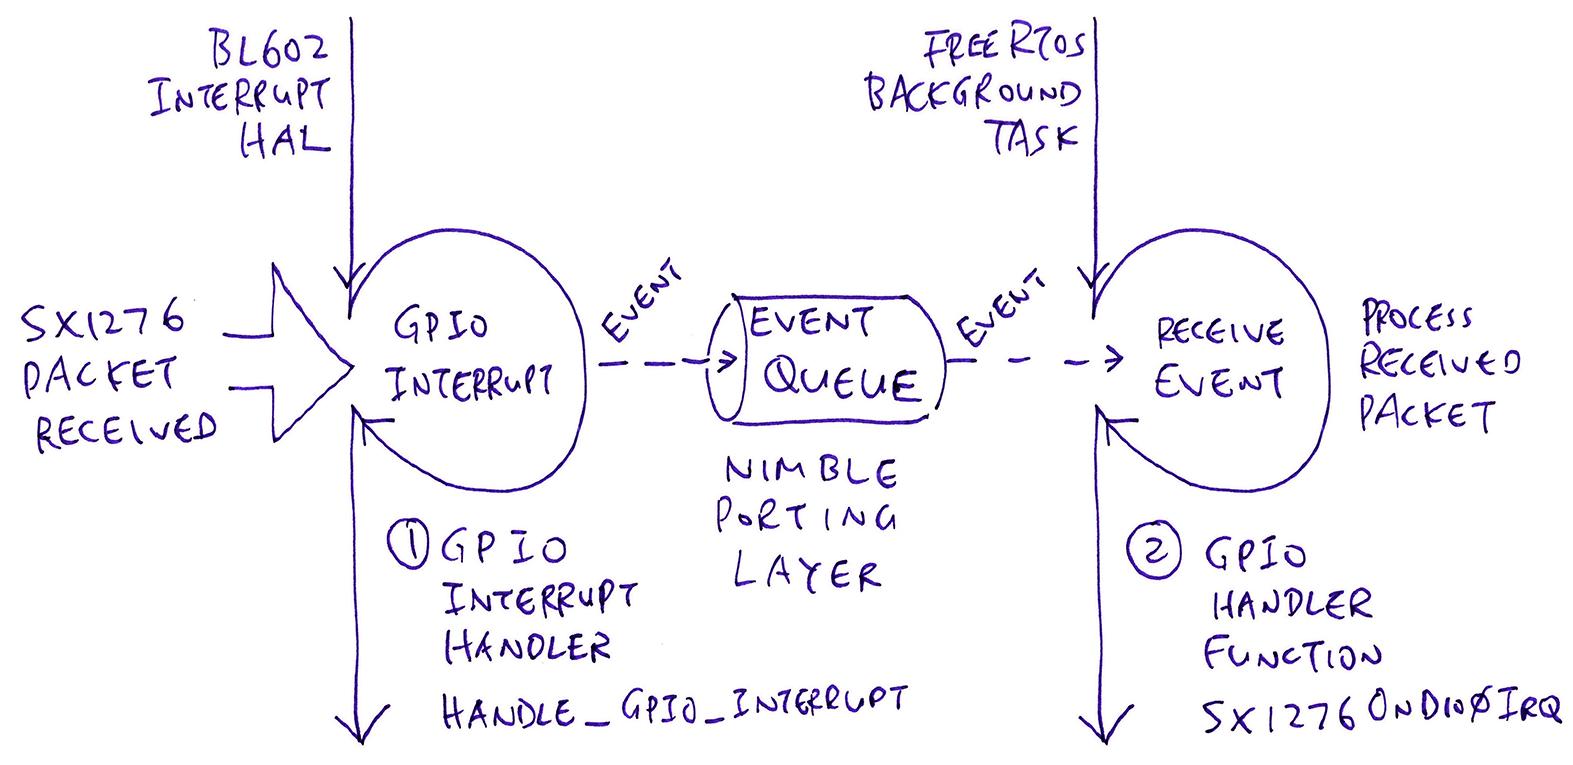 GPIO Interrupt Handler vs GPIO Handler Function